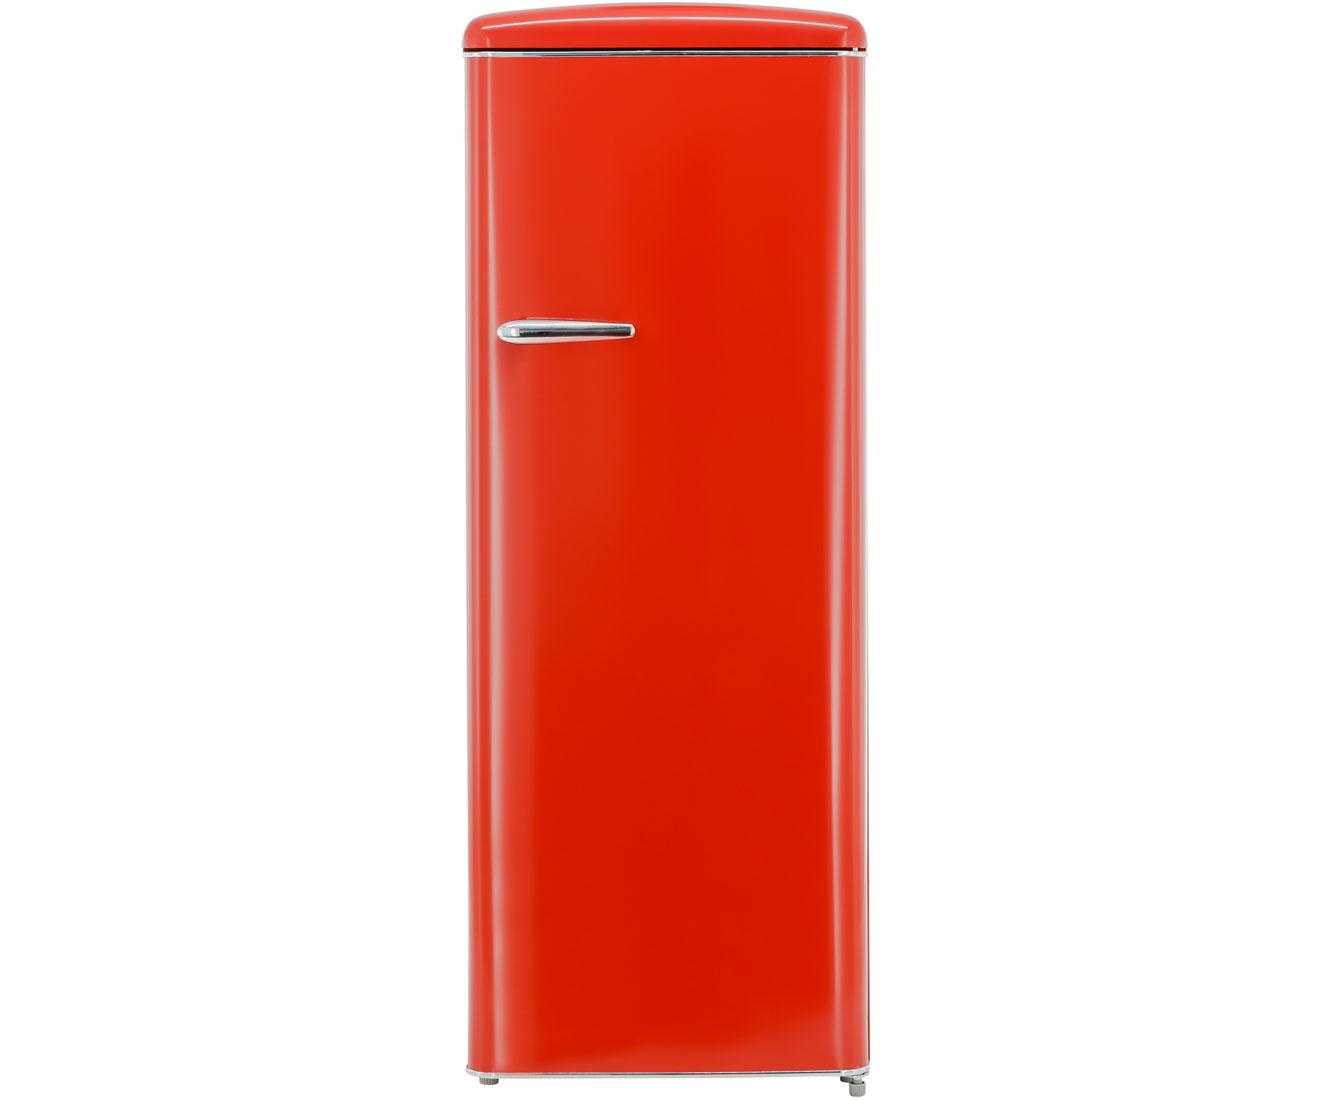 Retro Kühlschrank Rot Günstig : Exquisit rks rva kühlschrank rot retro design a